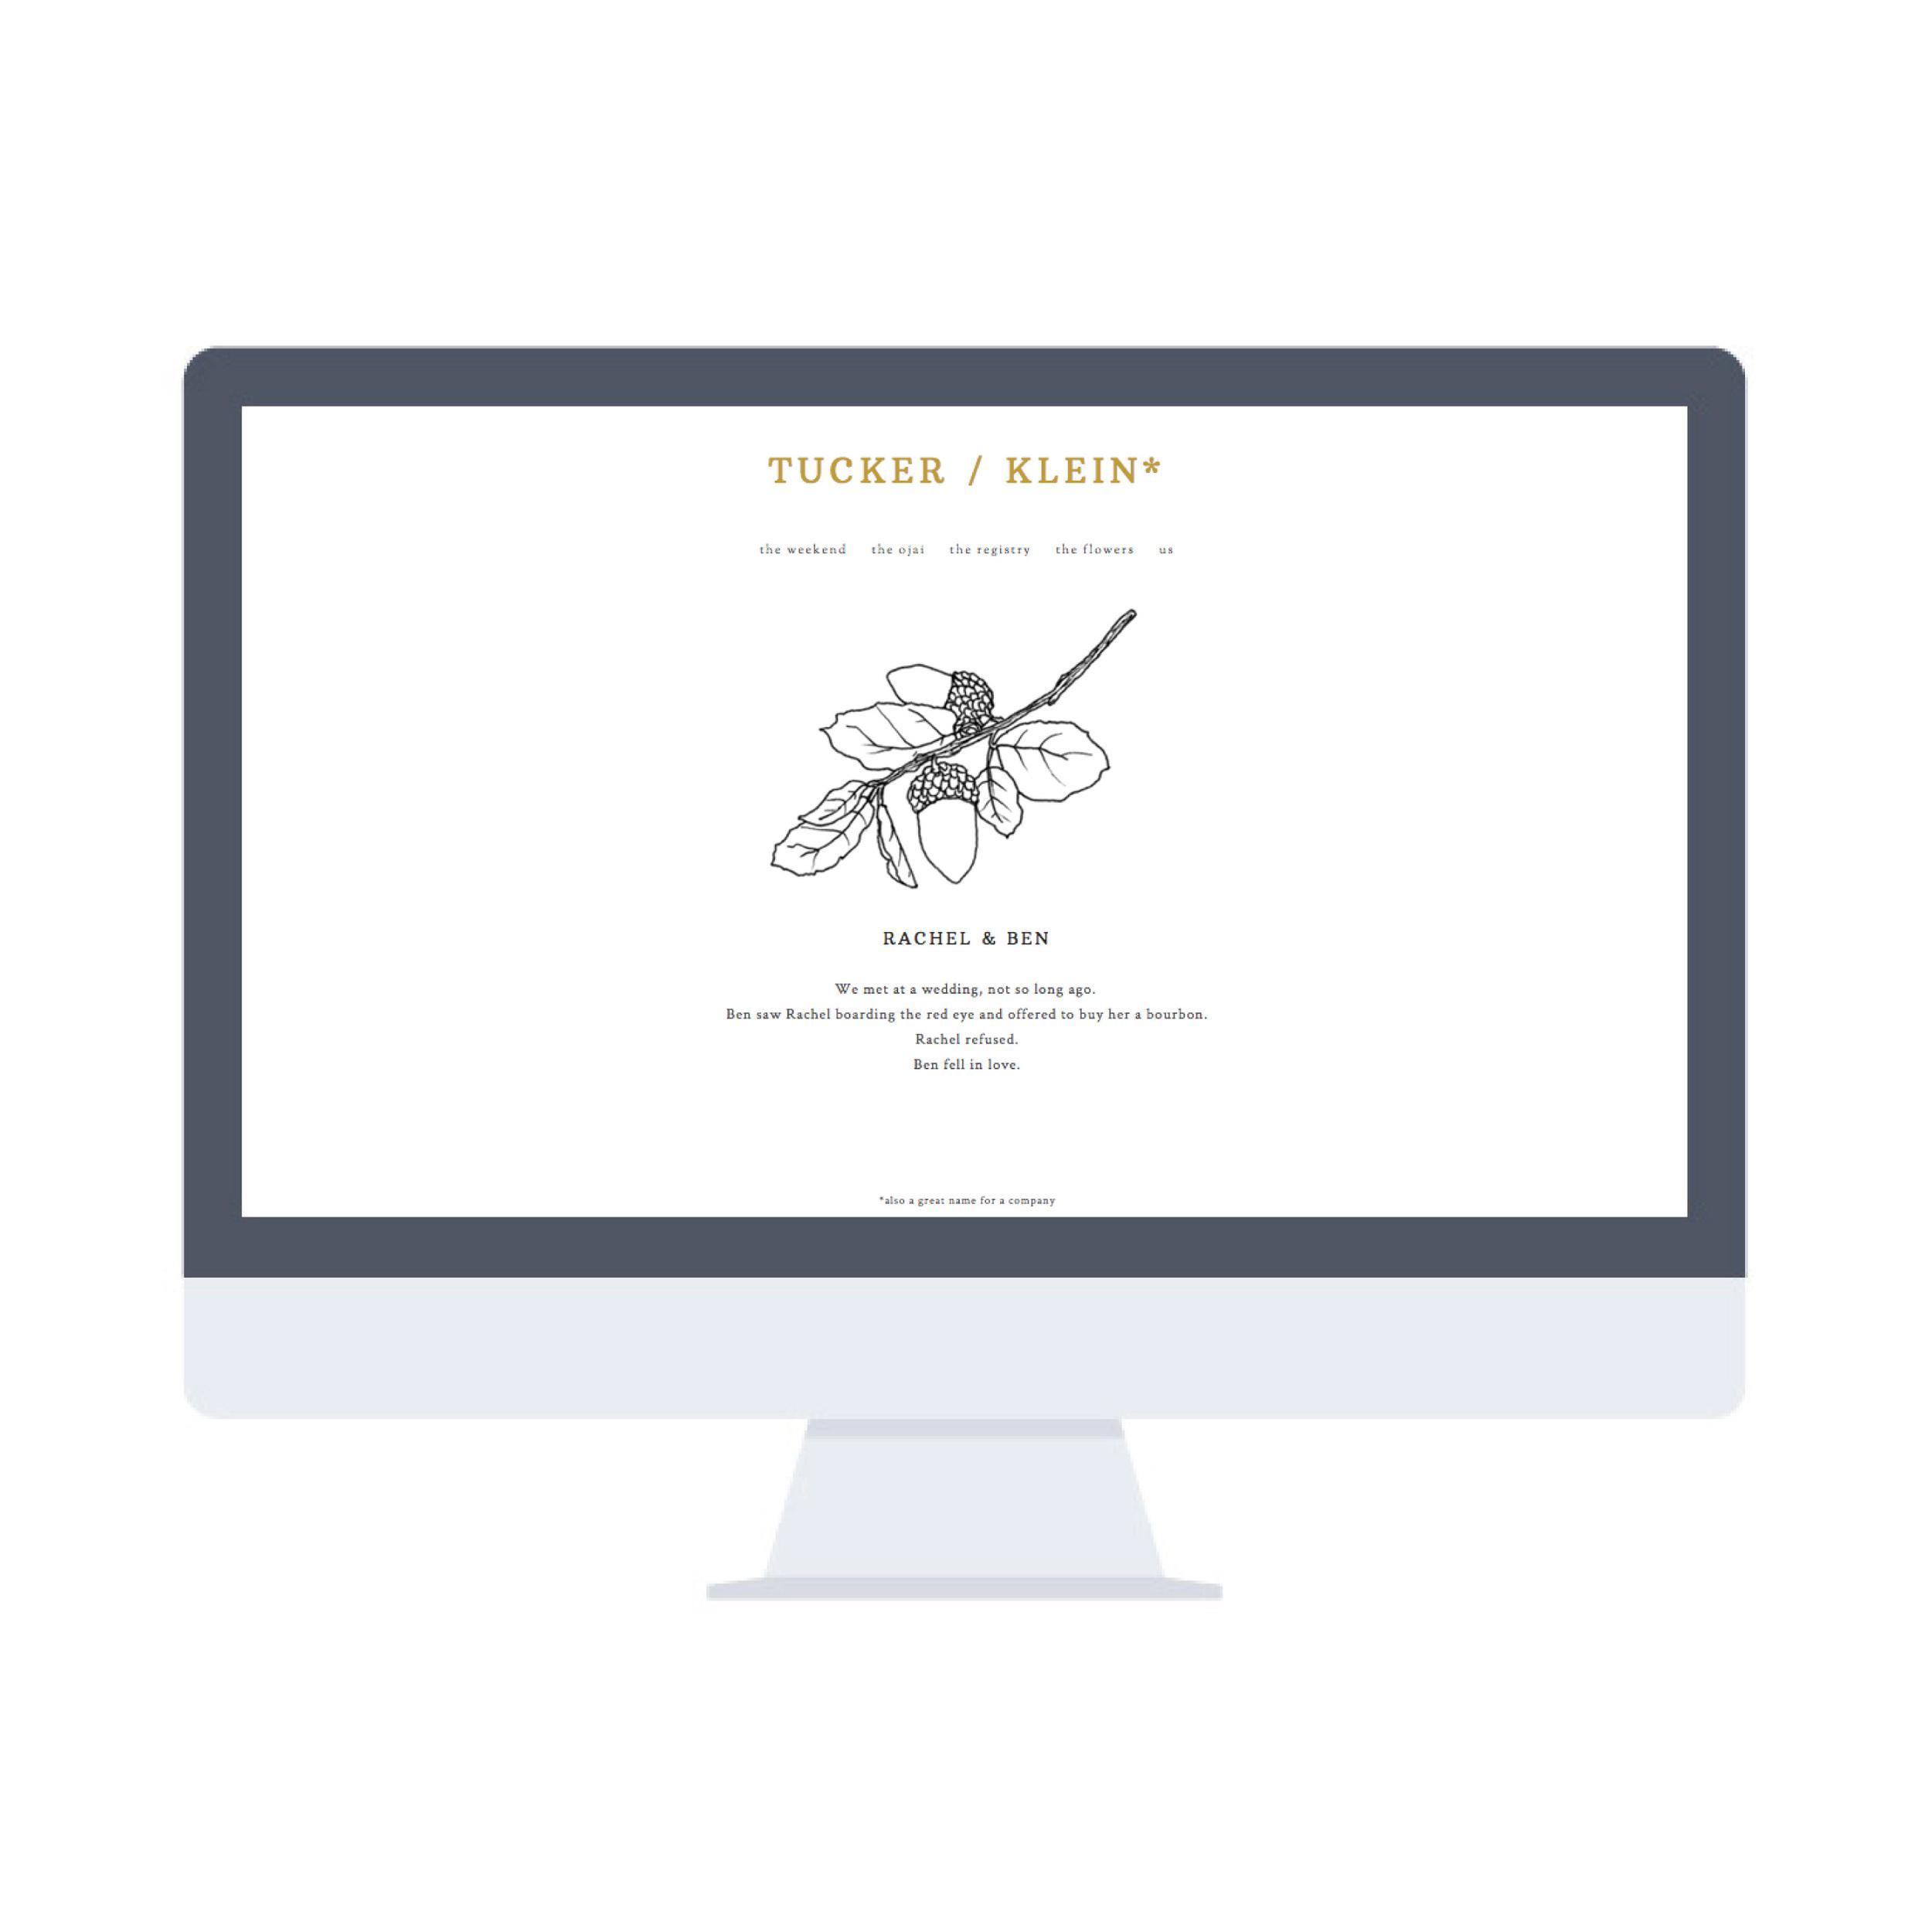 TUCKER-KLEIN web-1.jpg